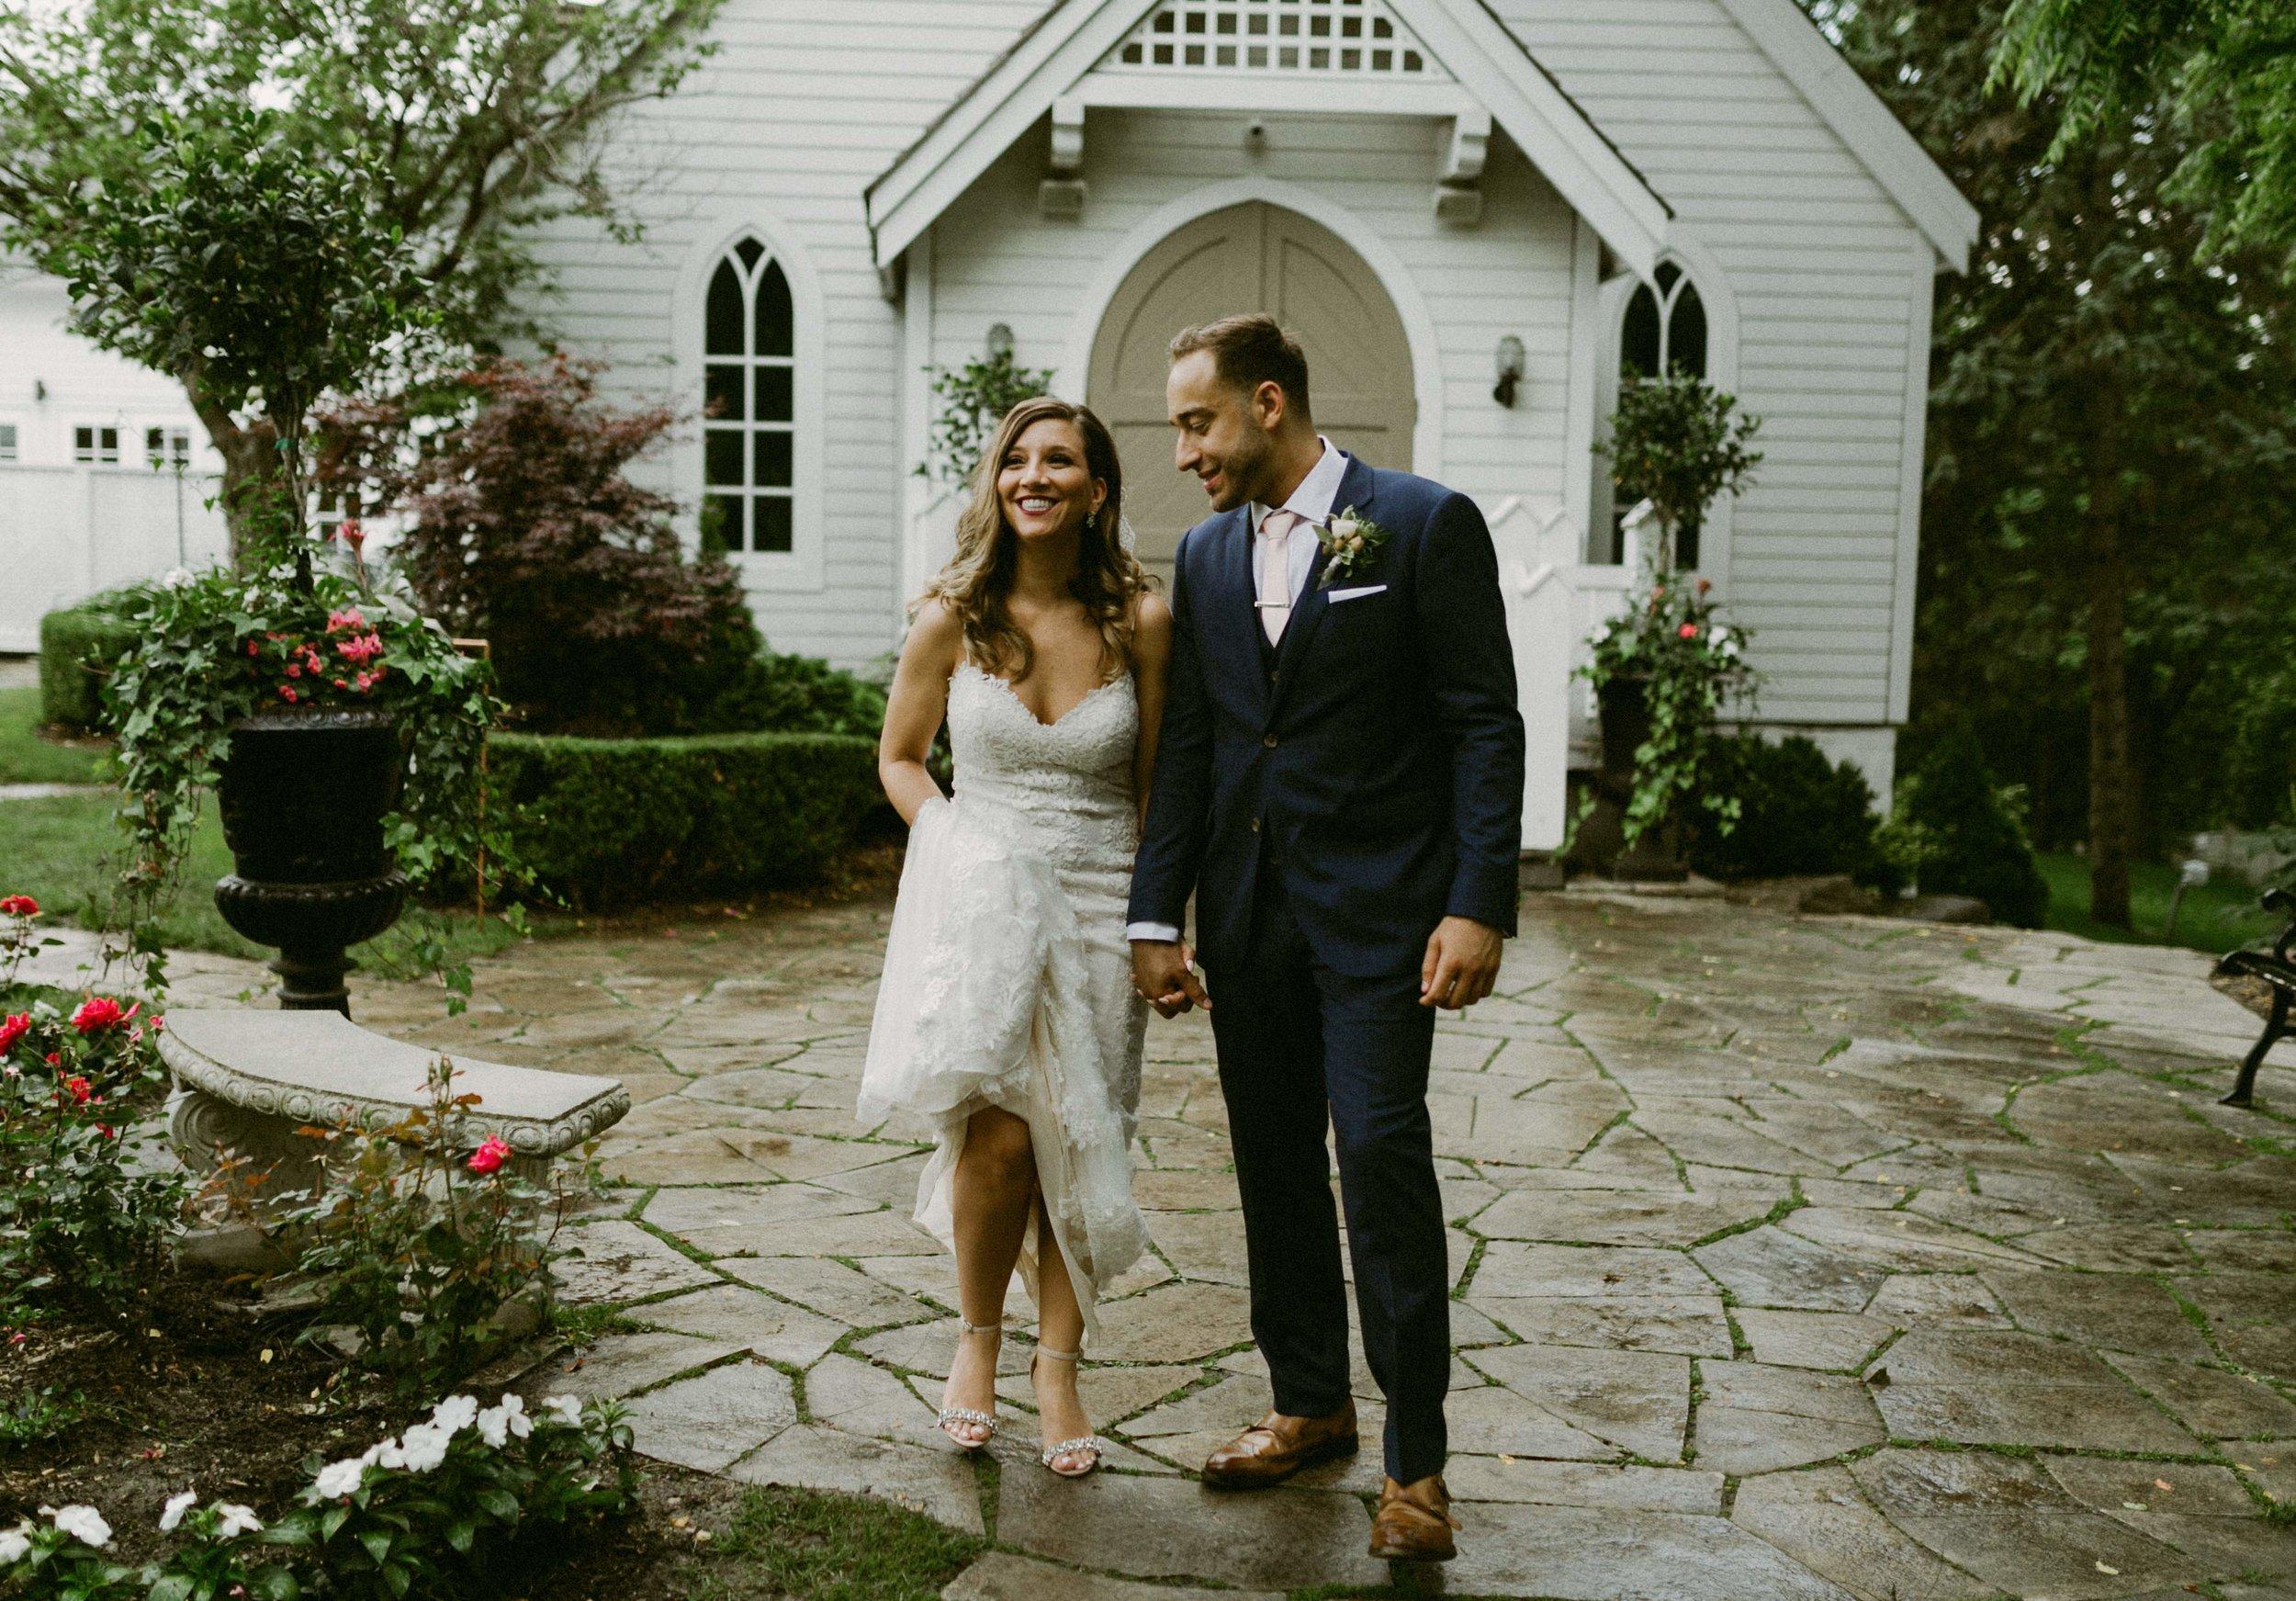 DanielaKamal_WEDDING_DOCTORSHOUSE_bisouseventsYAS-163ASE.jpg